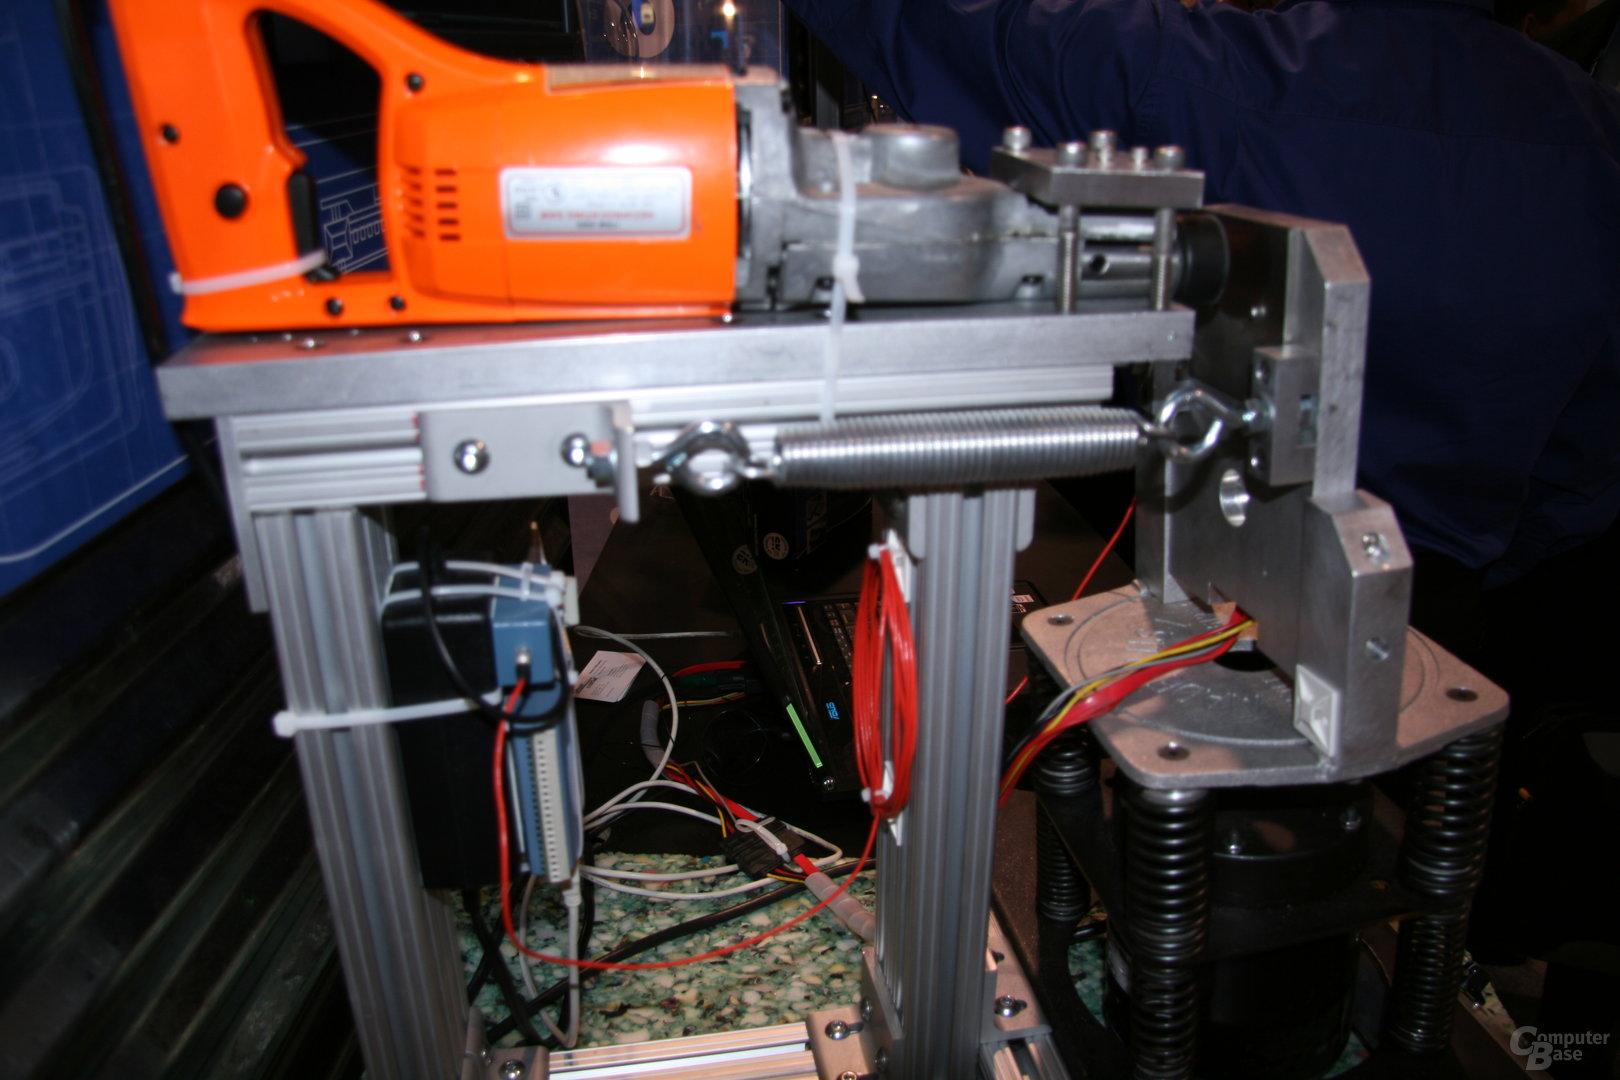 Solid State Drive von Crucial im Shaker